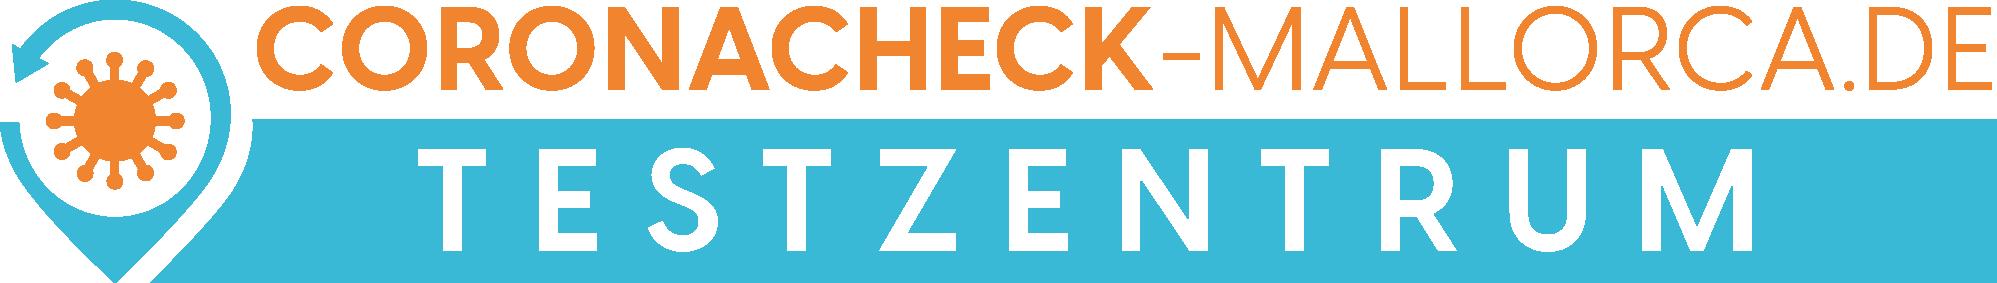 Coronacheck Mallorca Logo Web horizontal